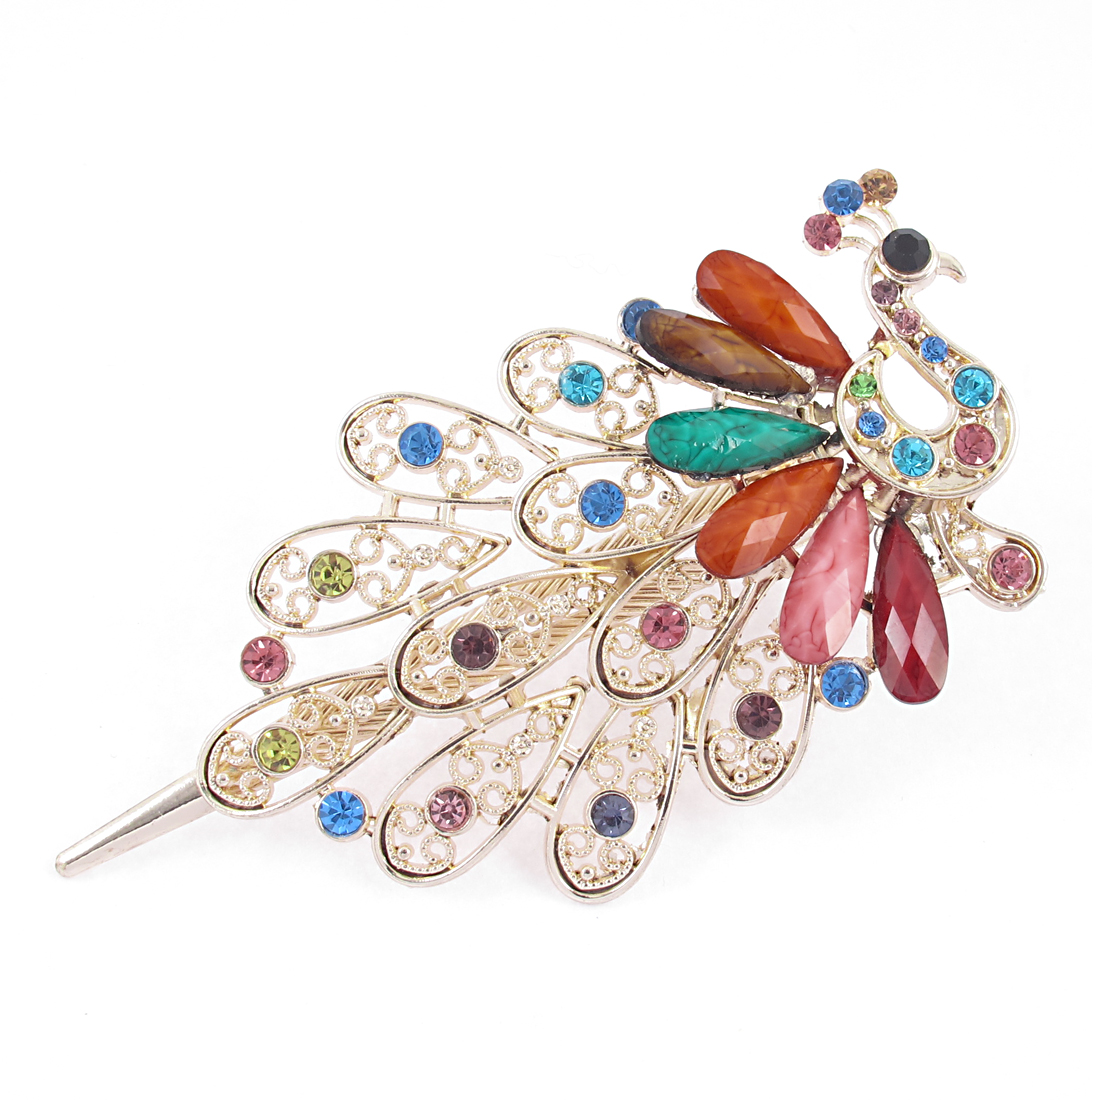 Lady Faux Rhinestone Gemstone Detail Peacock Design Barrette Hairclip